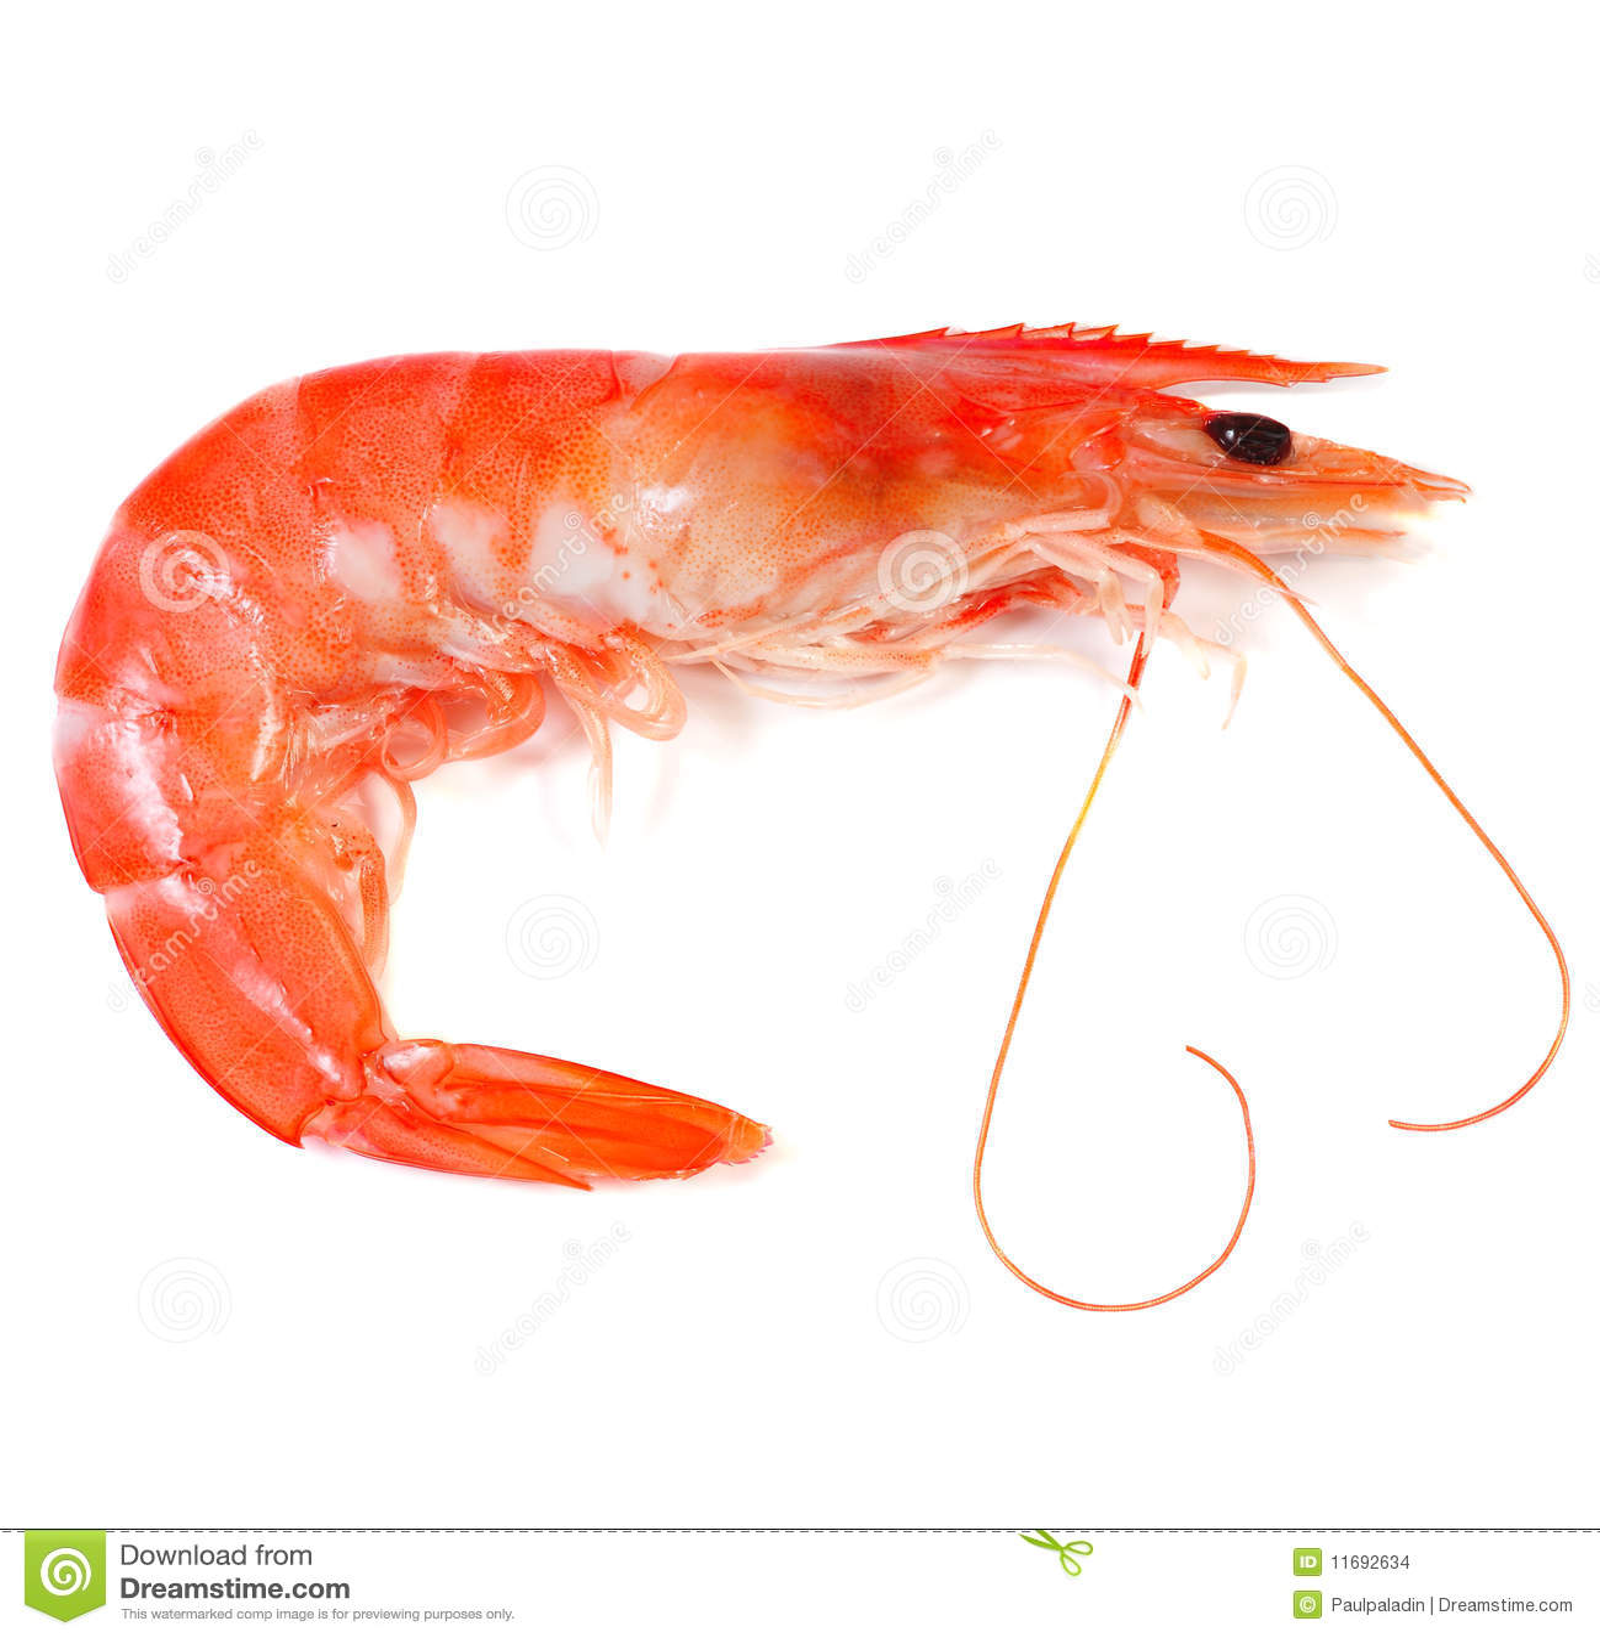 Prawn Shrimp Stock Images - Image: 11692634